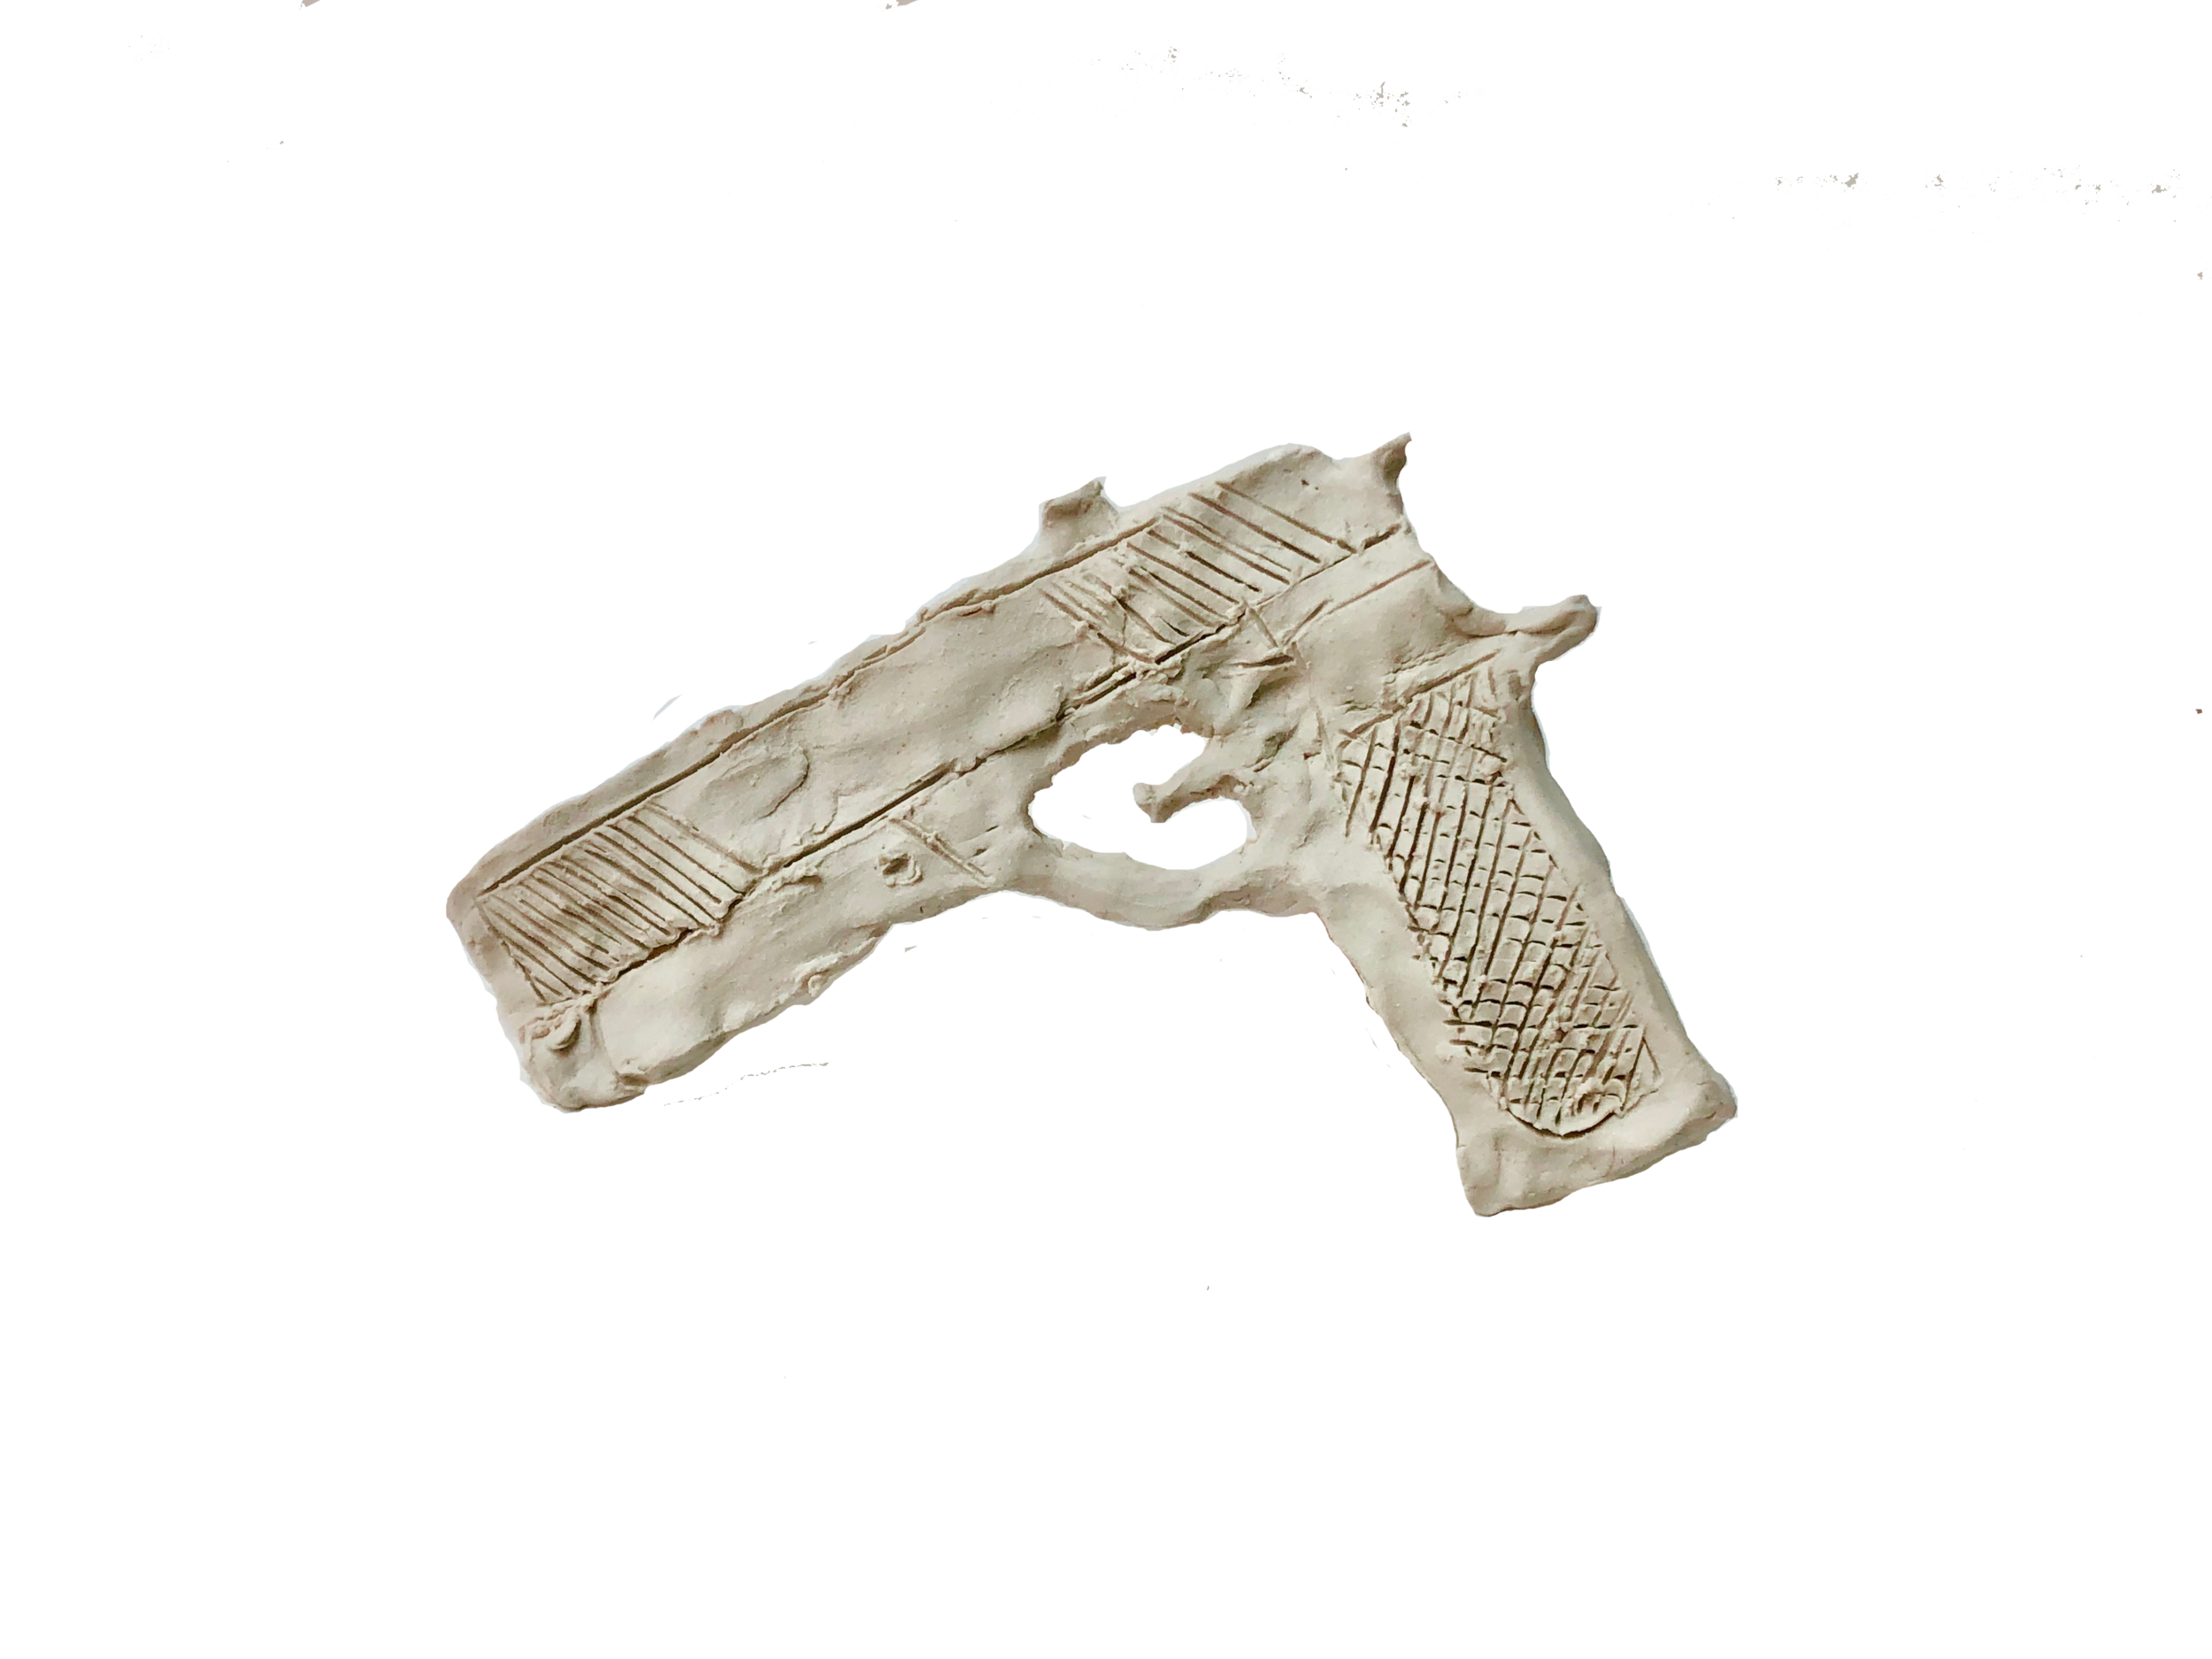 toy gun_ACLU_4.19.png